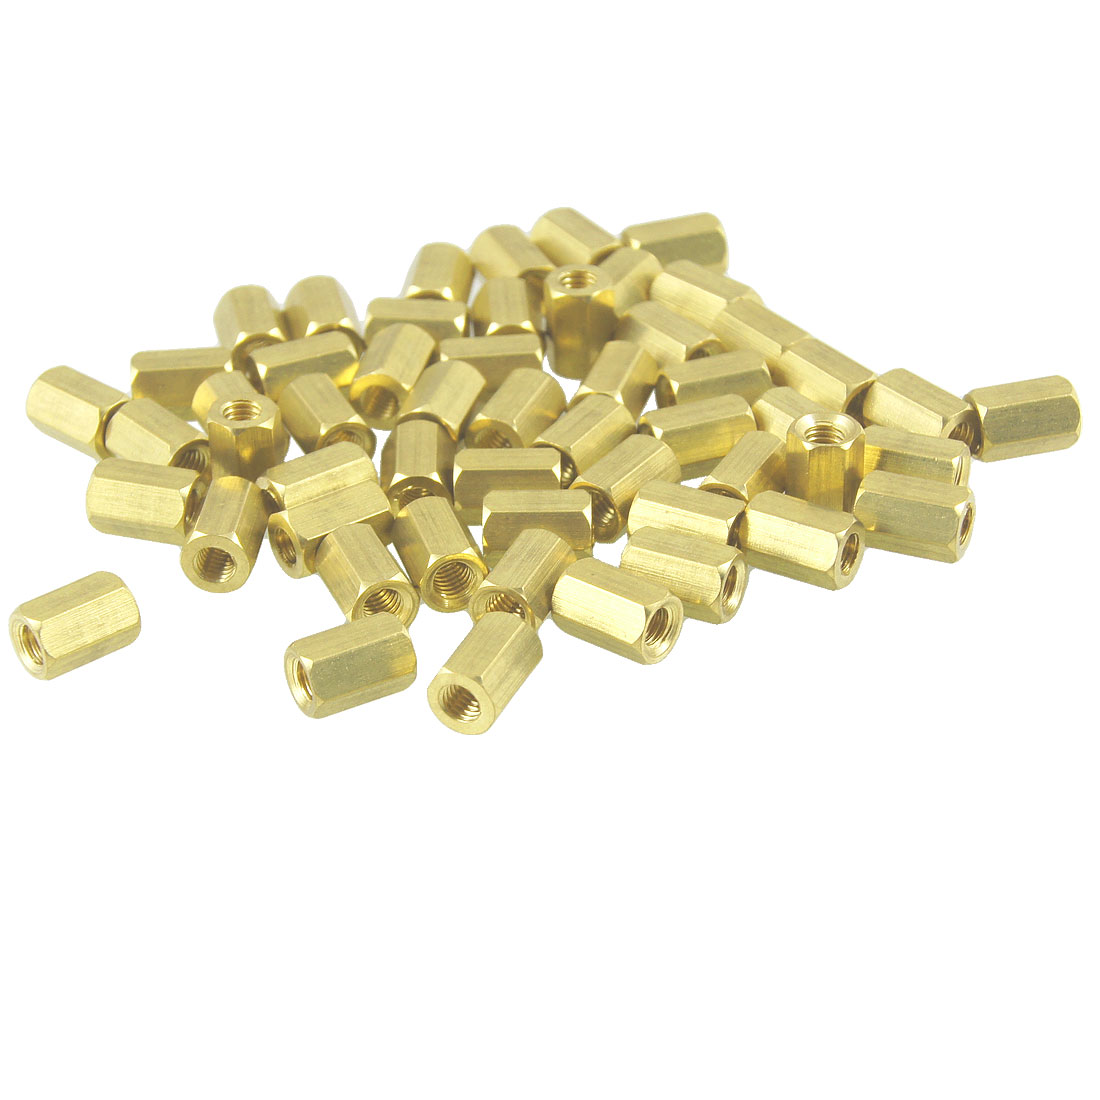 50 Pcs M3X7mm Gold Tone Female Thread Standoff Hexagonal Spacers